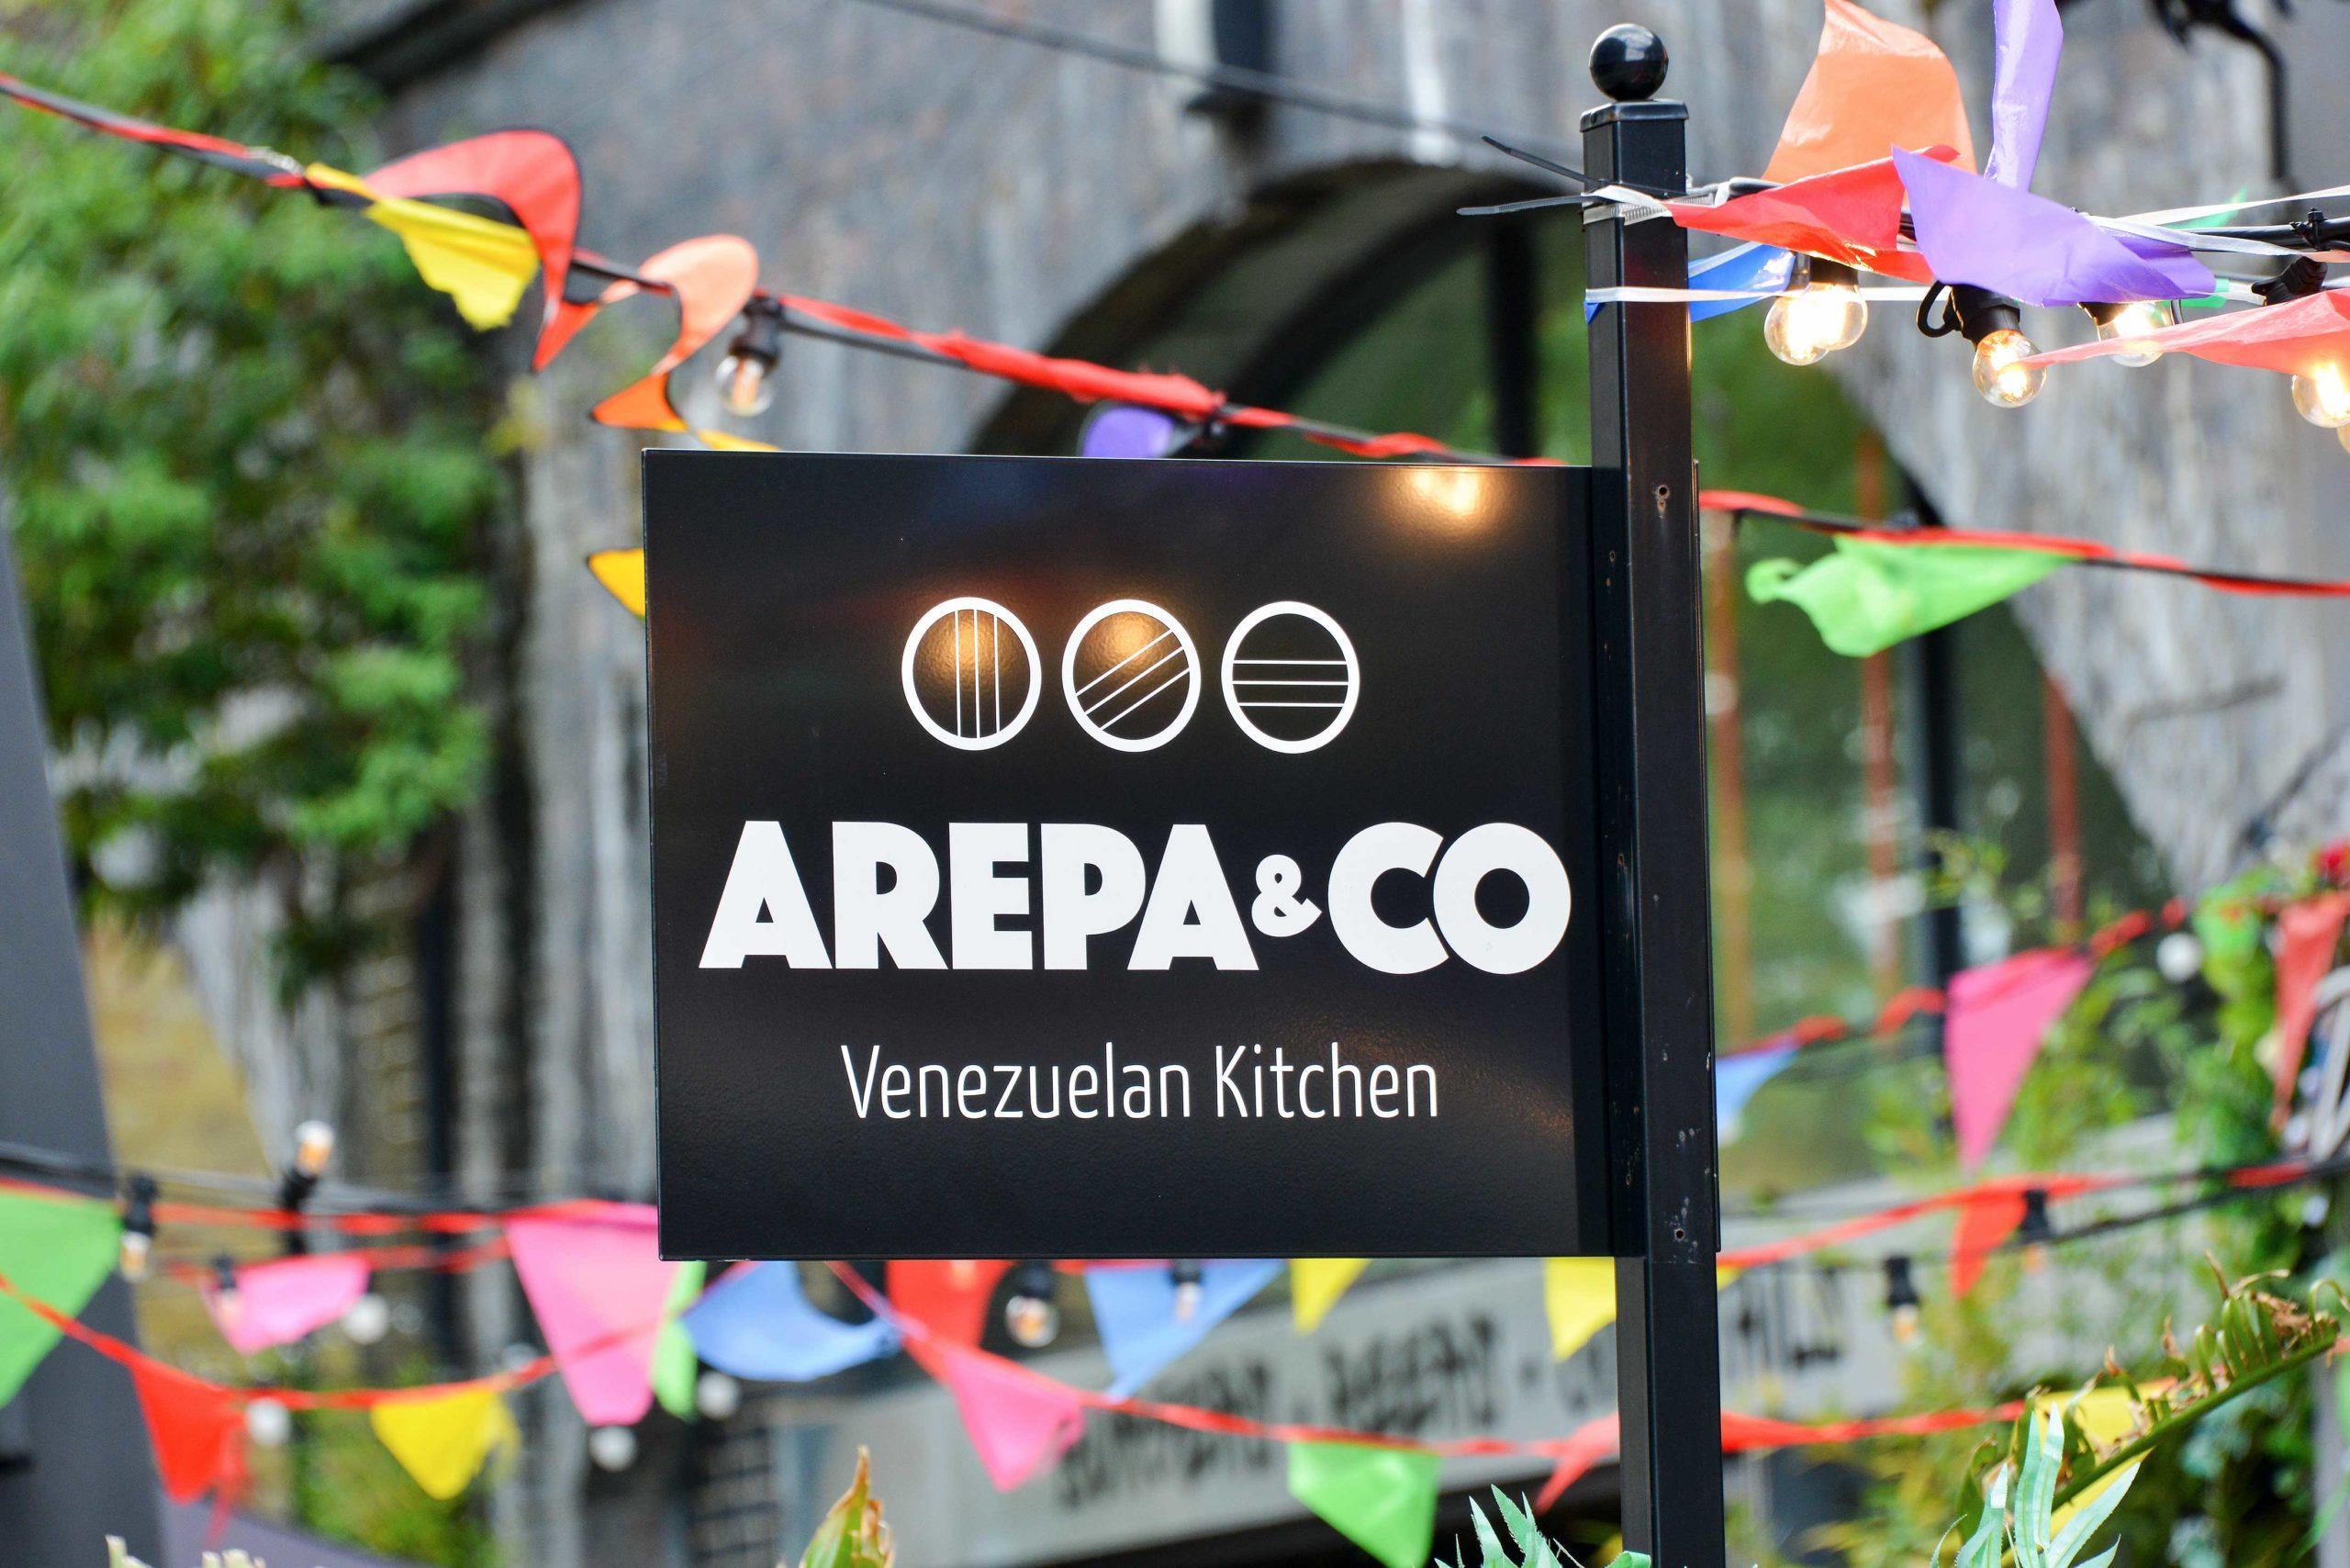 Arepa & Co Venezuelan Kitchen Bethnal Green